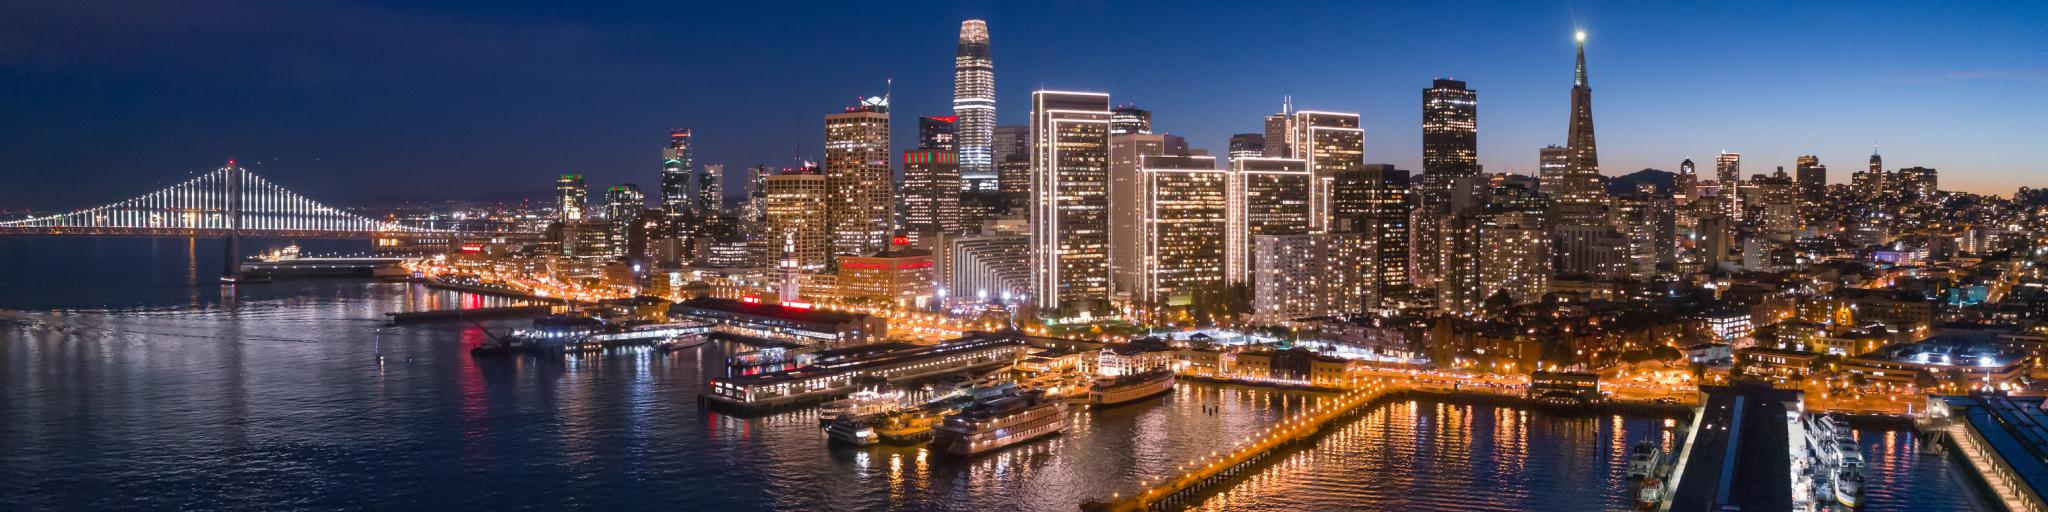 Panoramic evening view of San Francisco